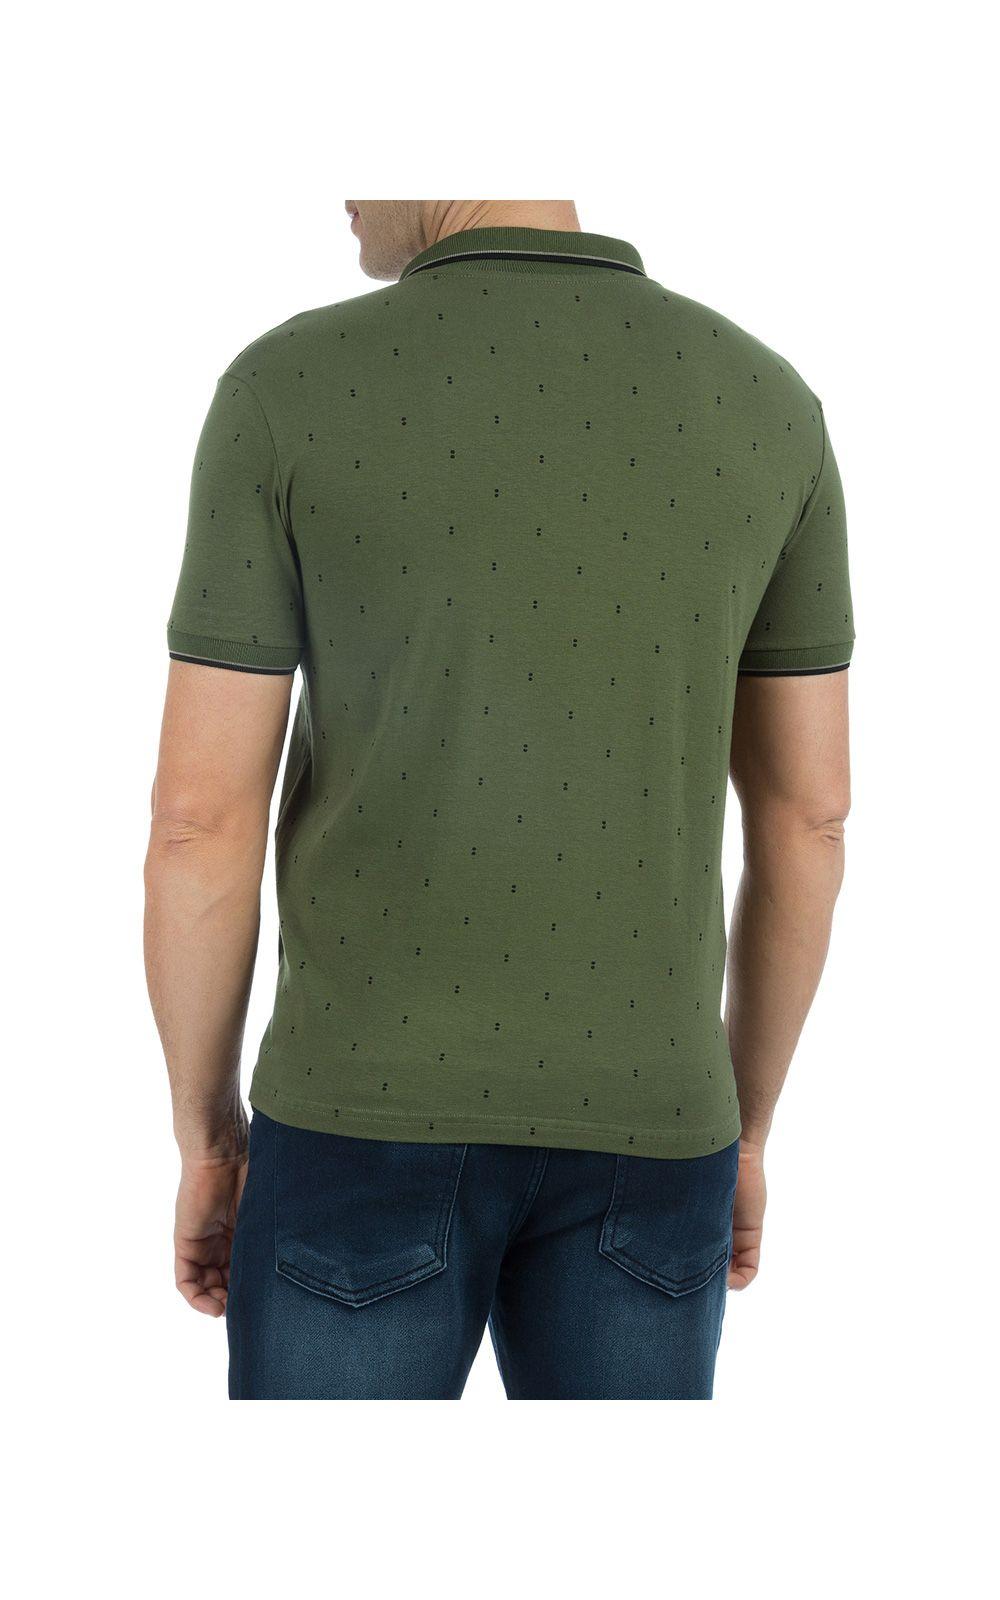 Foto 2 - Camisa Polo Masculina Verde Estampada